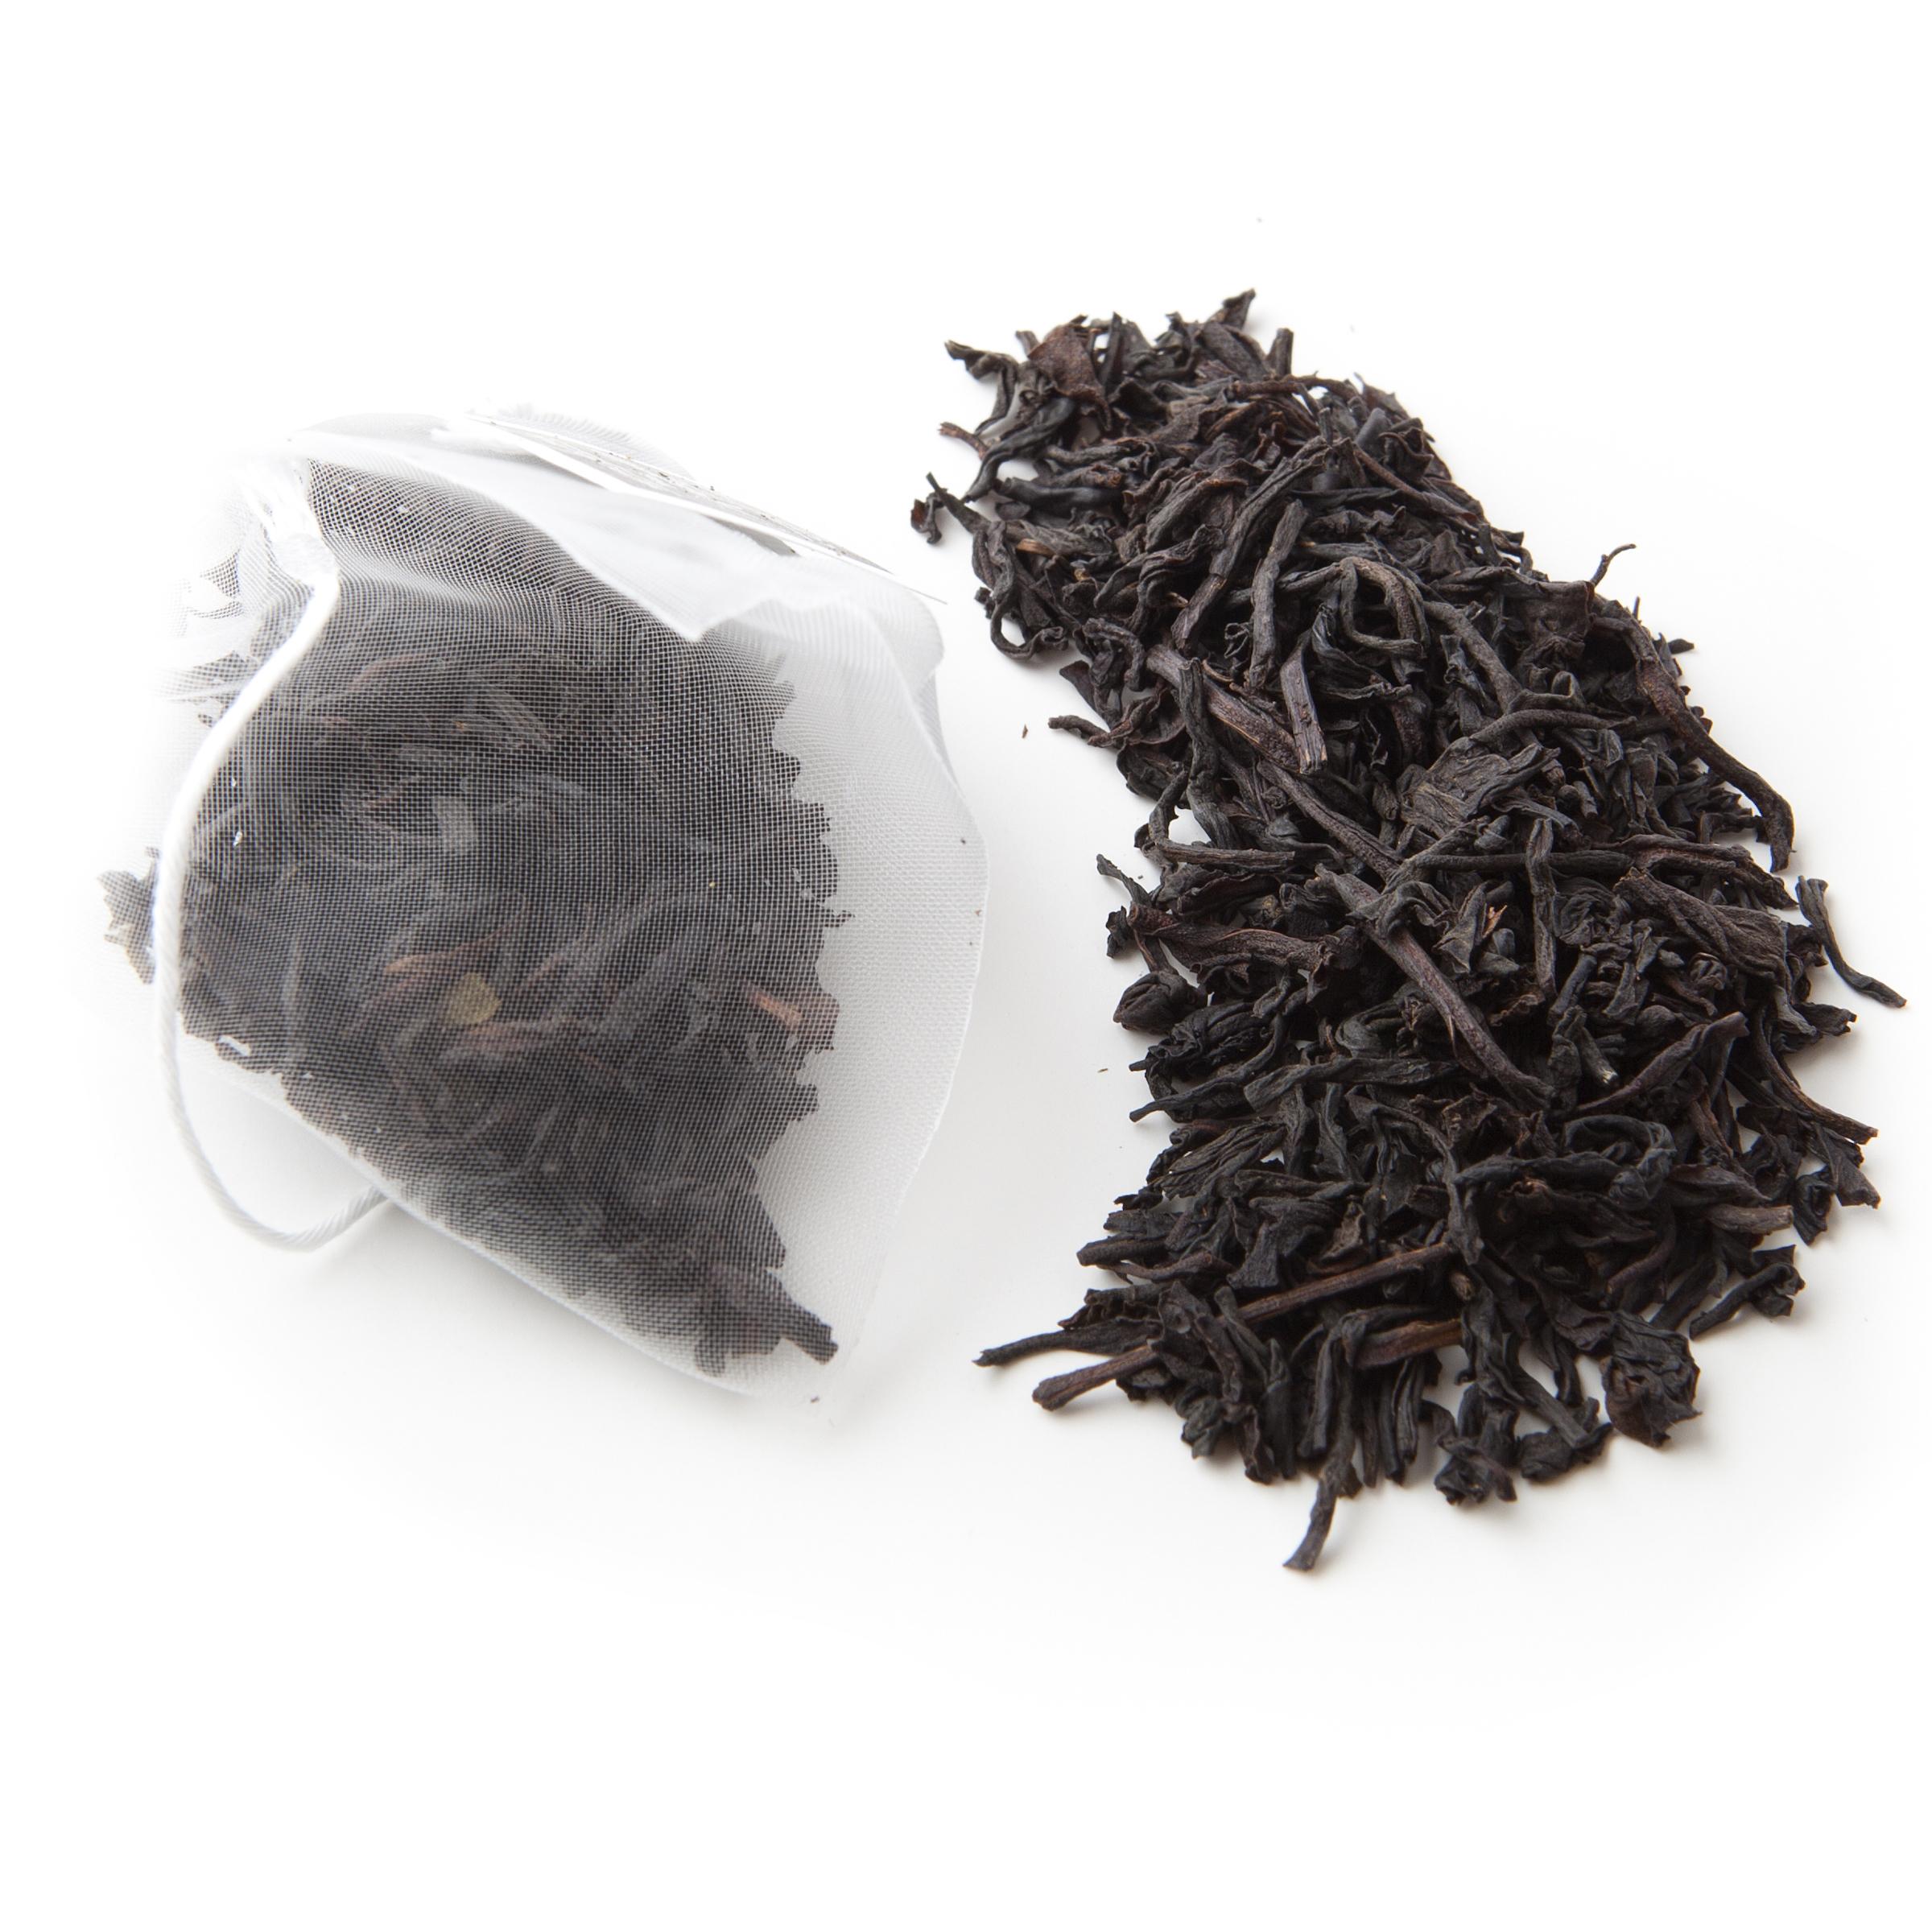 Earl Grey Tea - Caffeine Free 19921